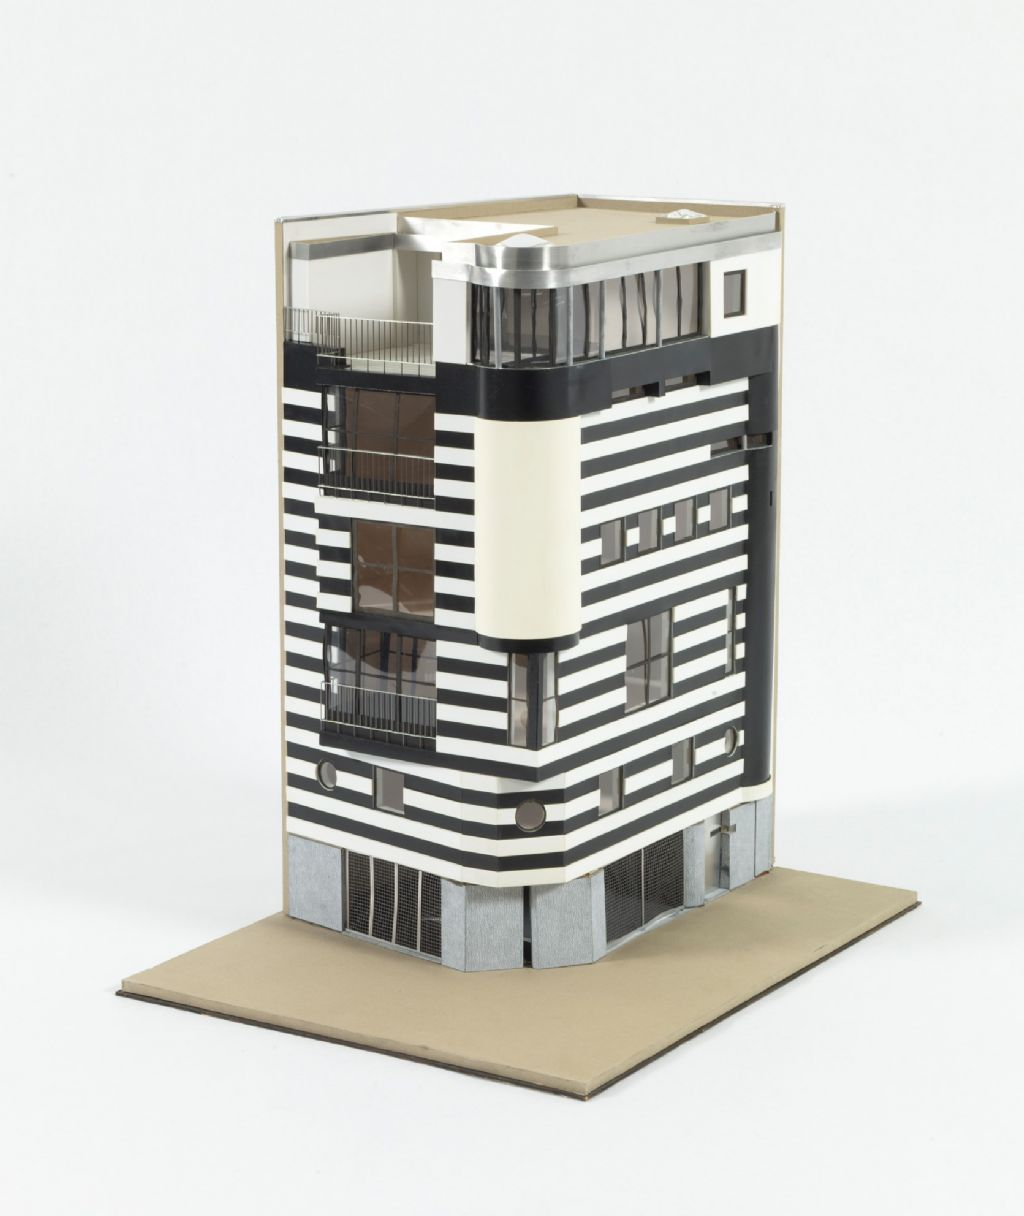 bOb Van Reeth  AWG Architecten, Woning Van Roosmalen, Sint-Michielskaai, Antwerpen, 1985-87.